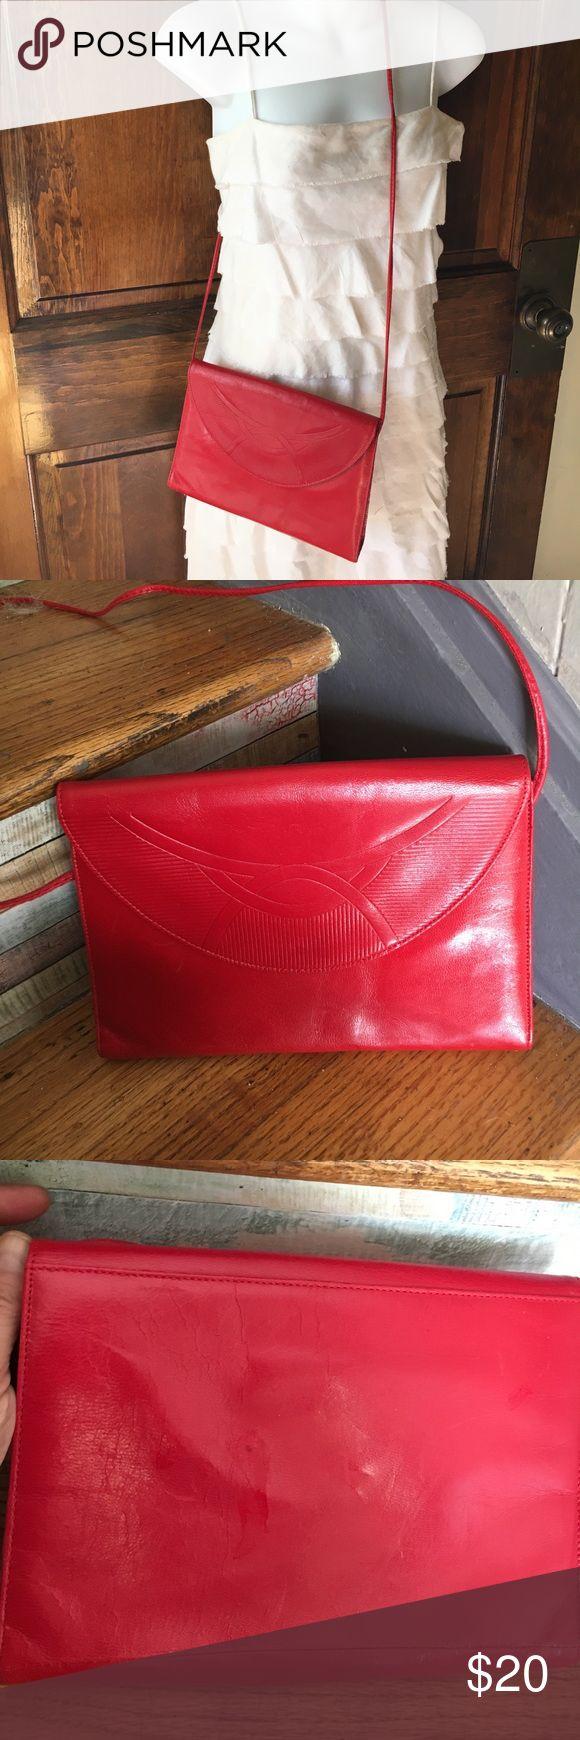 Vintage Chandlers evening bag Vintage red leather evening bag from Chandlers. chandlers Bags Crossbody Bags